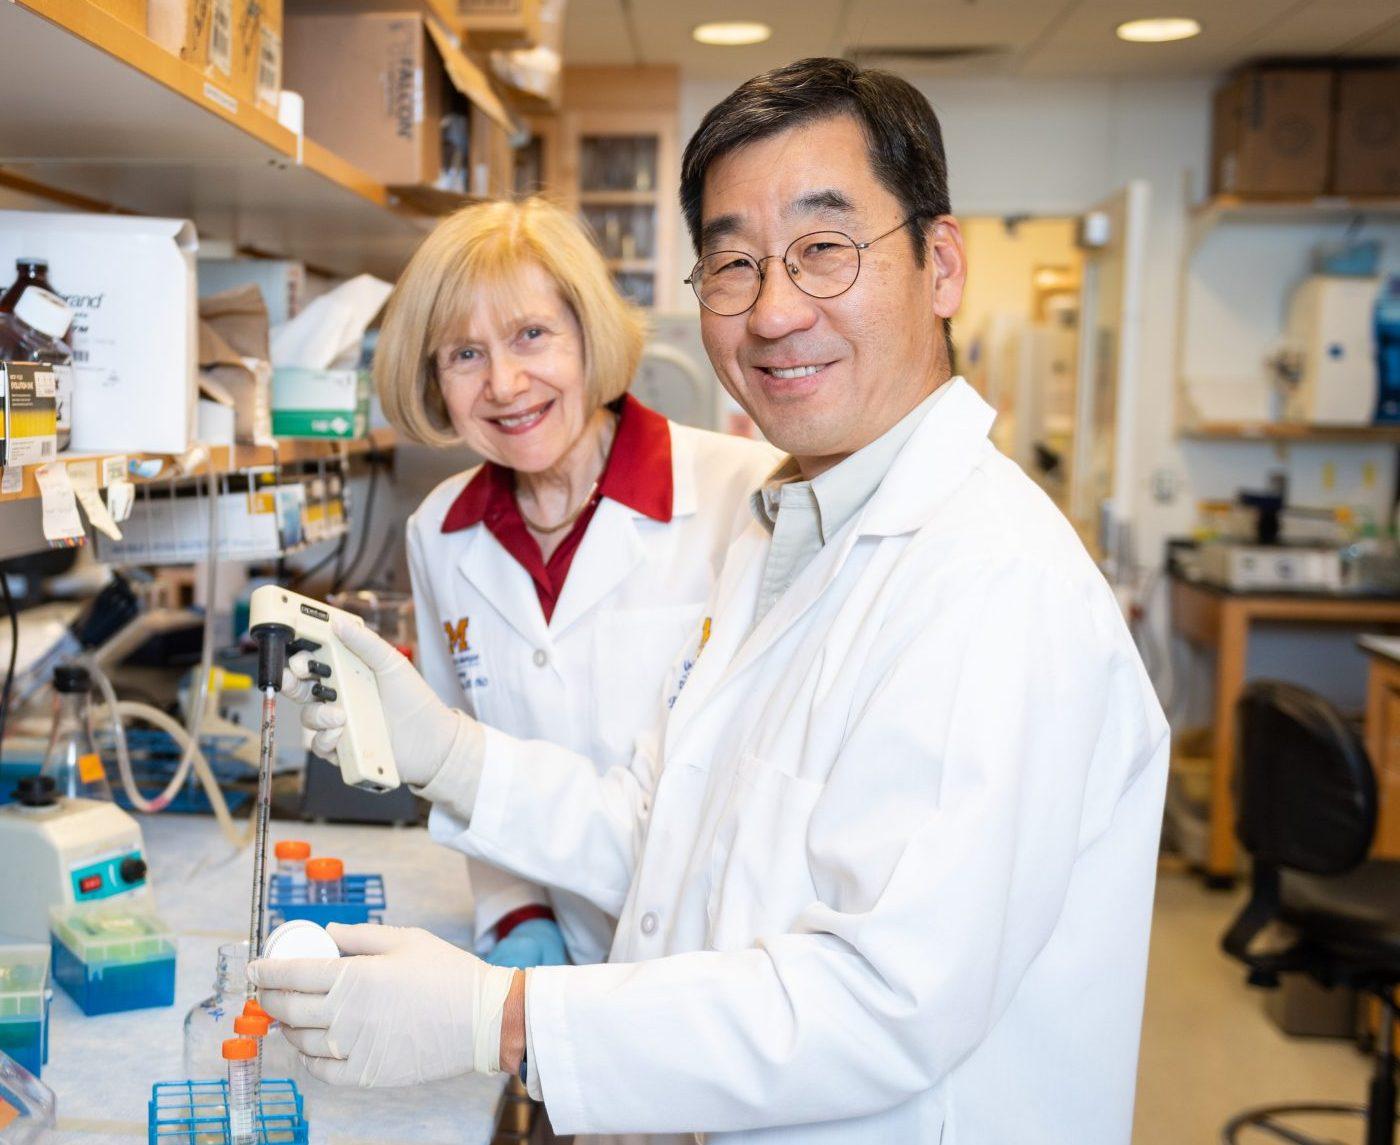 Eva Feldman, M.D., Ph.D., in the lab with Bhumsoo Kim, Ph.D.